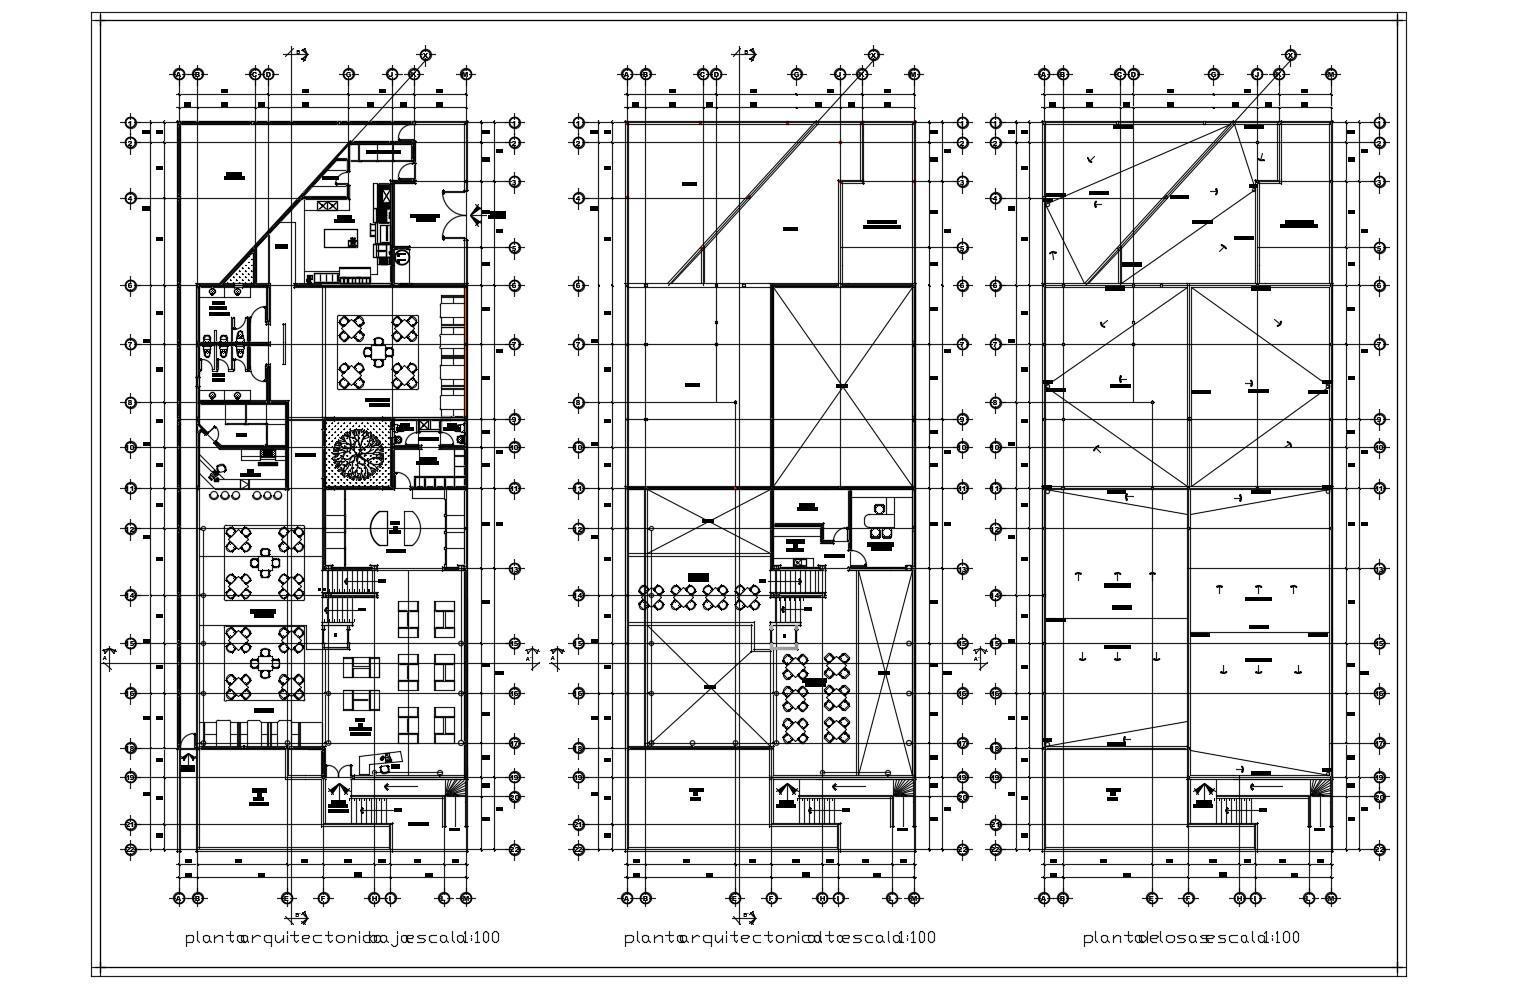 Restaurant Architectural Design in AutoCAD file